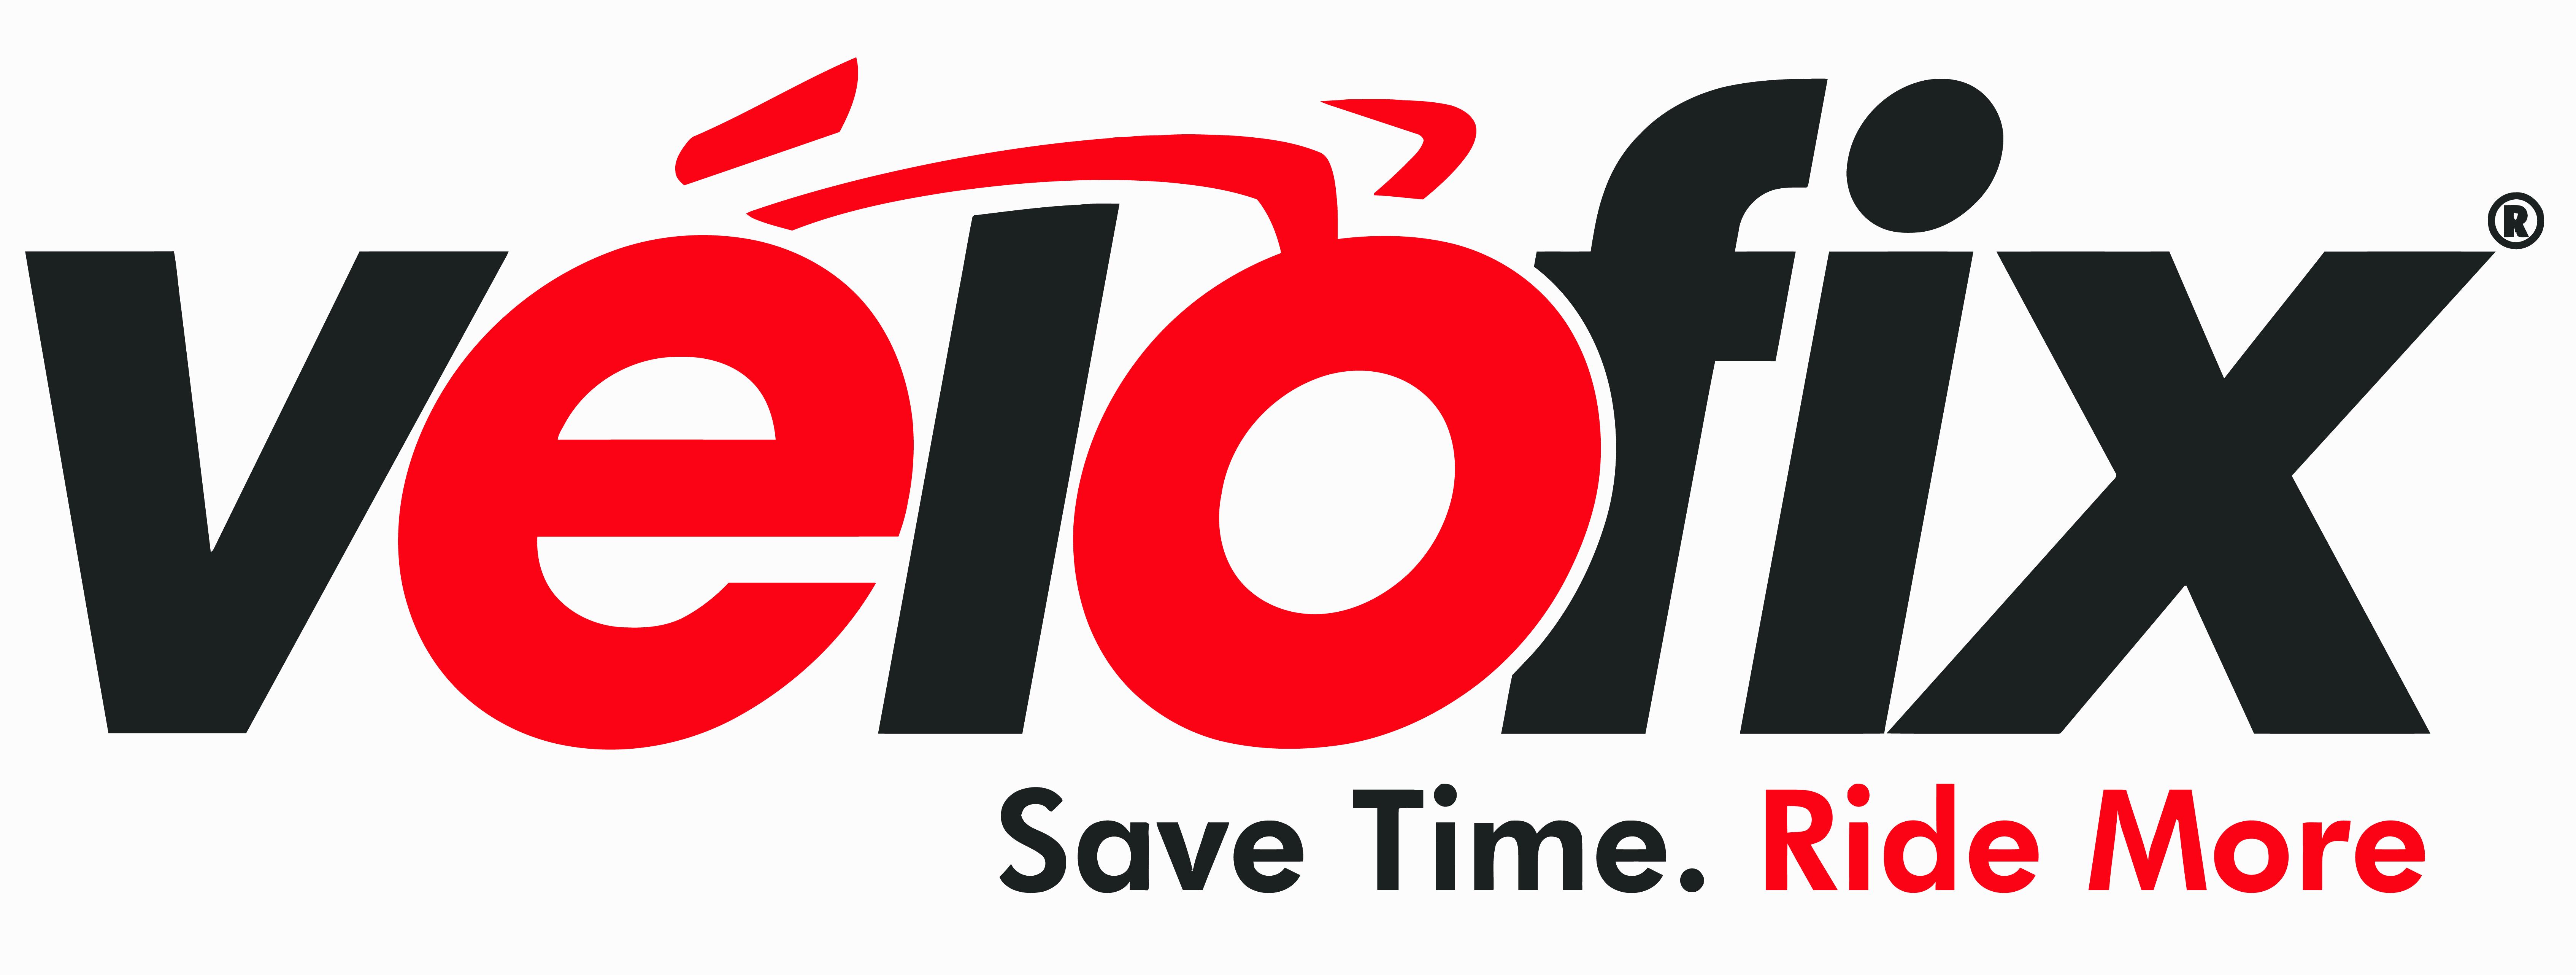 Velofix Logo